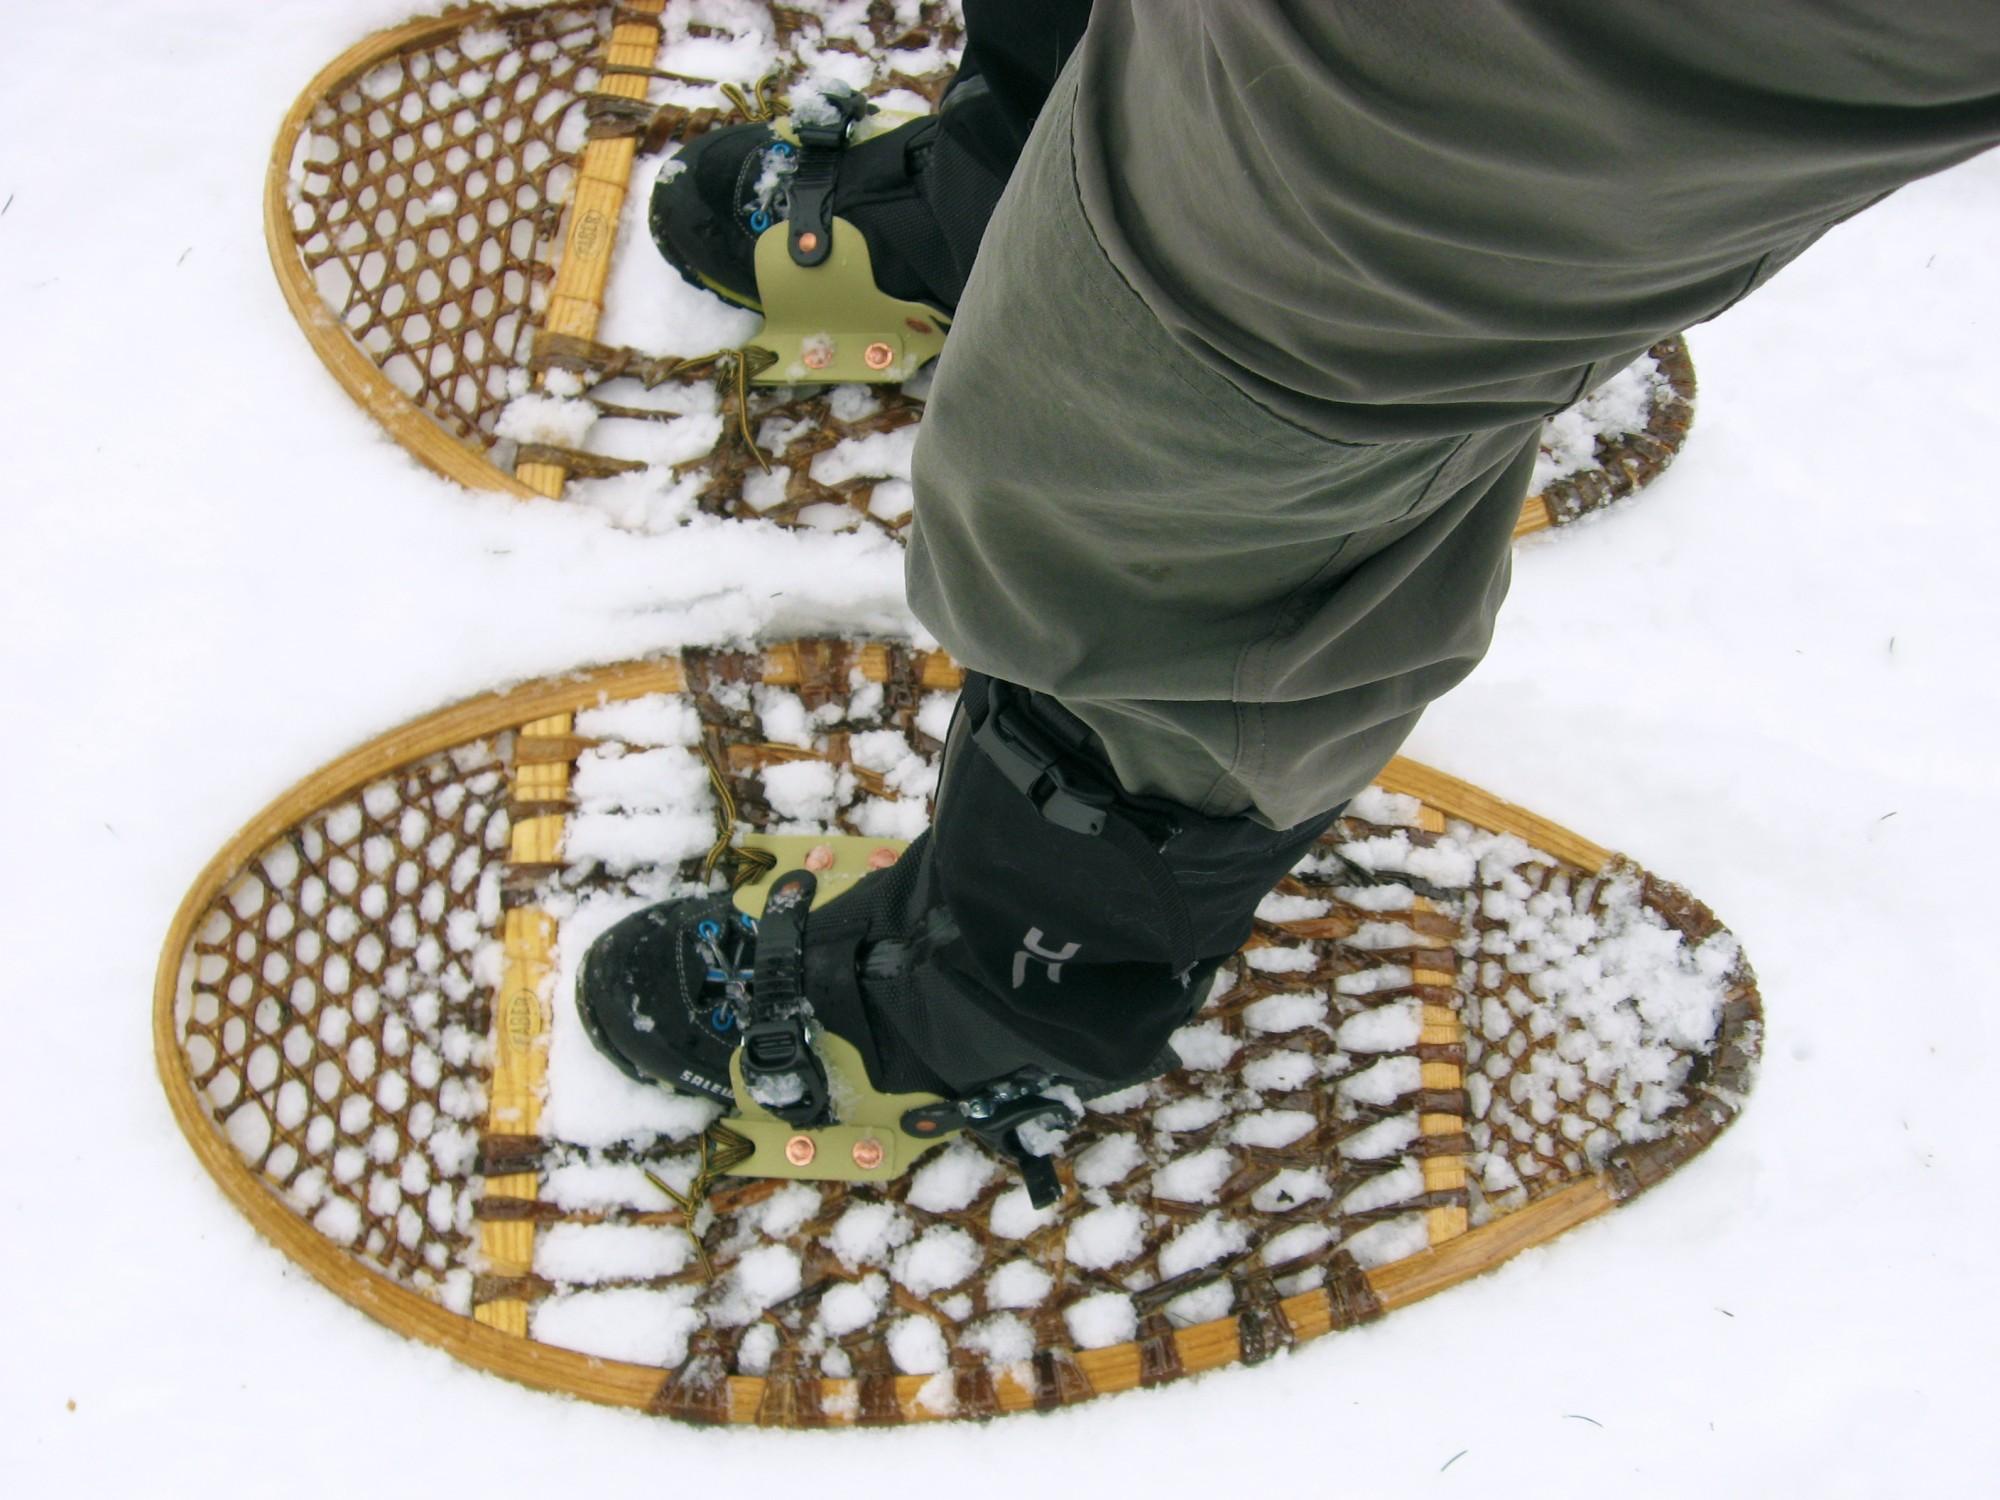 Bear Paw Snowshoes Kits